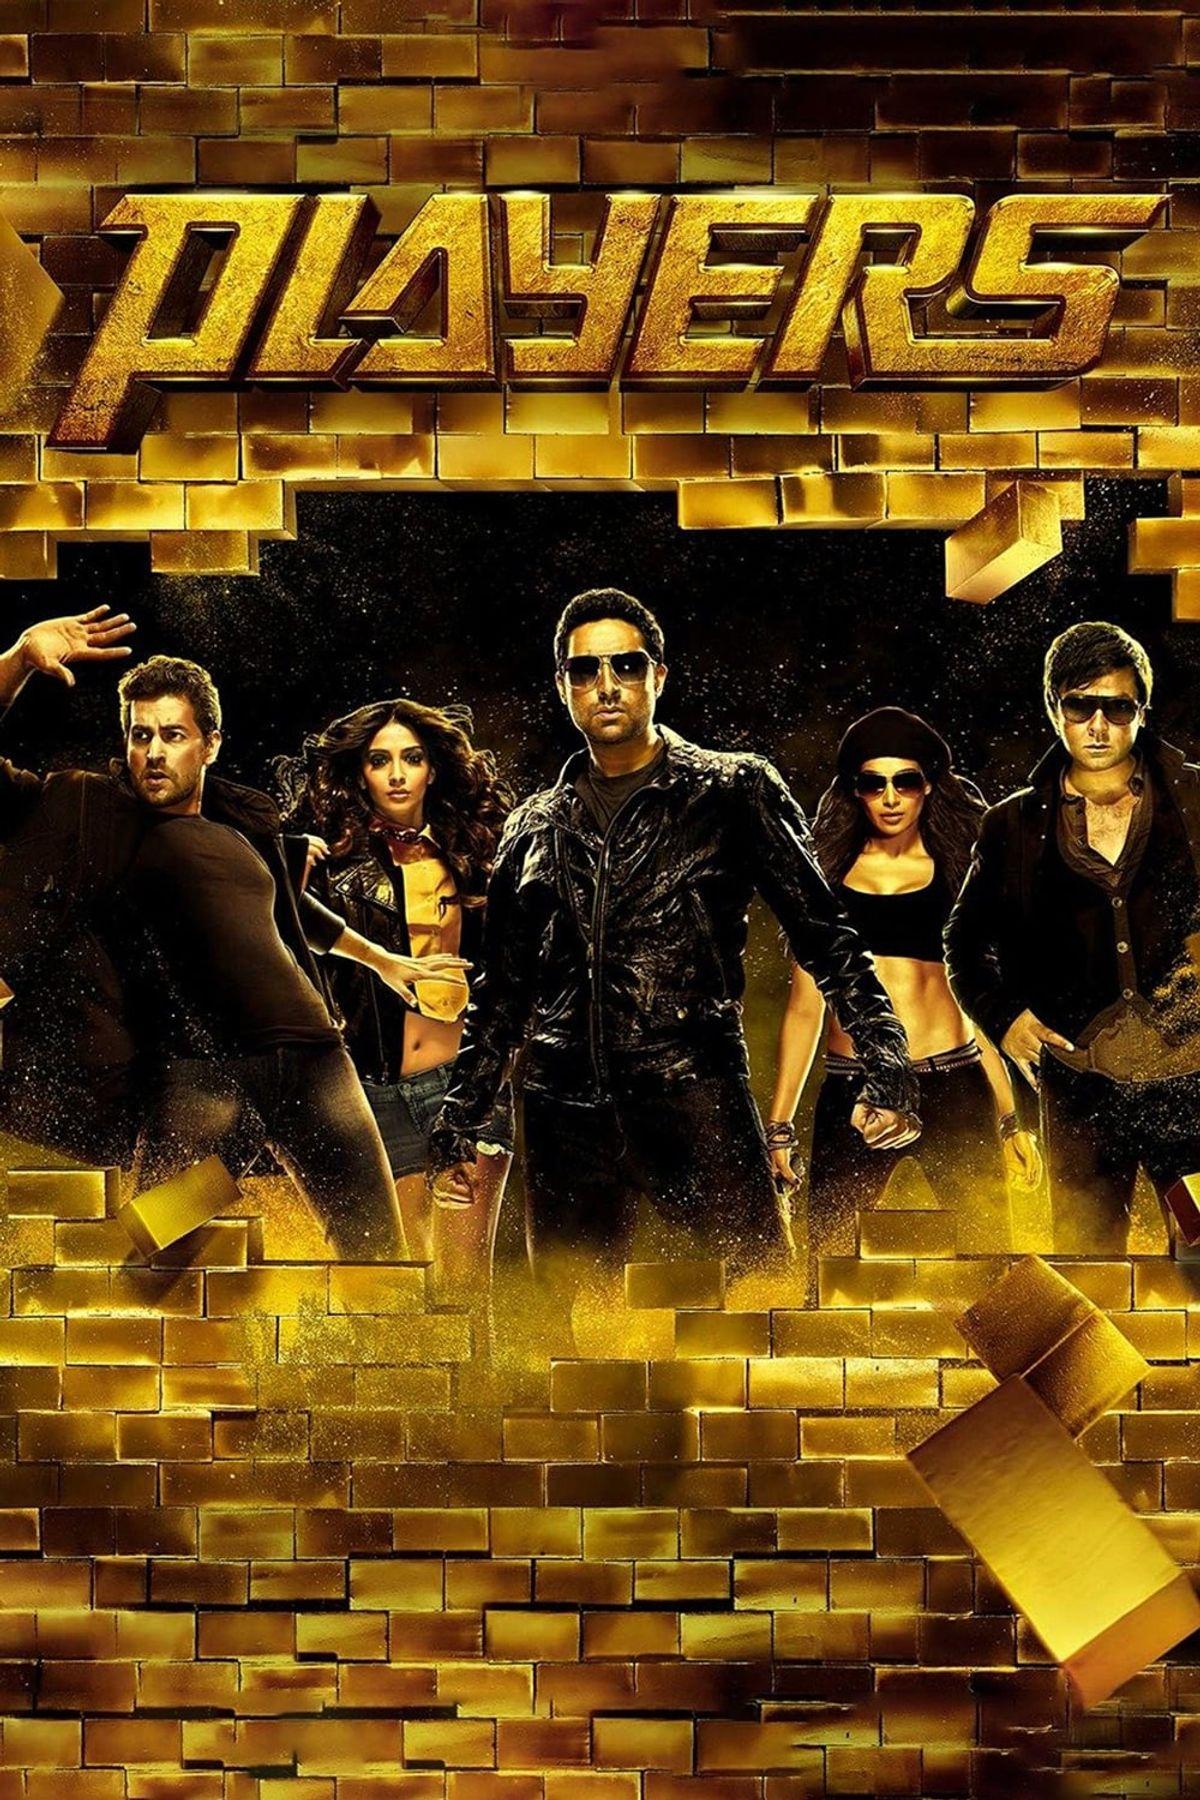 Shweta Bhardwaj Best Movies, TV Shows and Web Series List